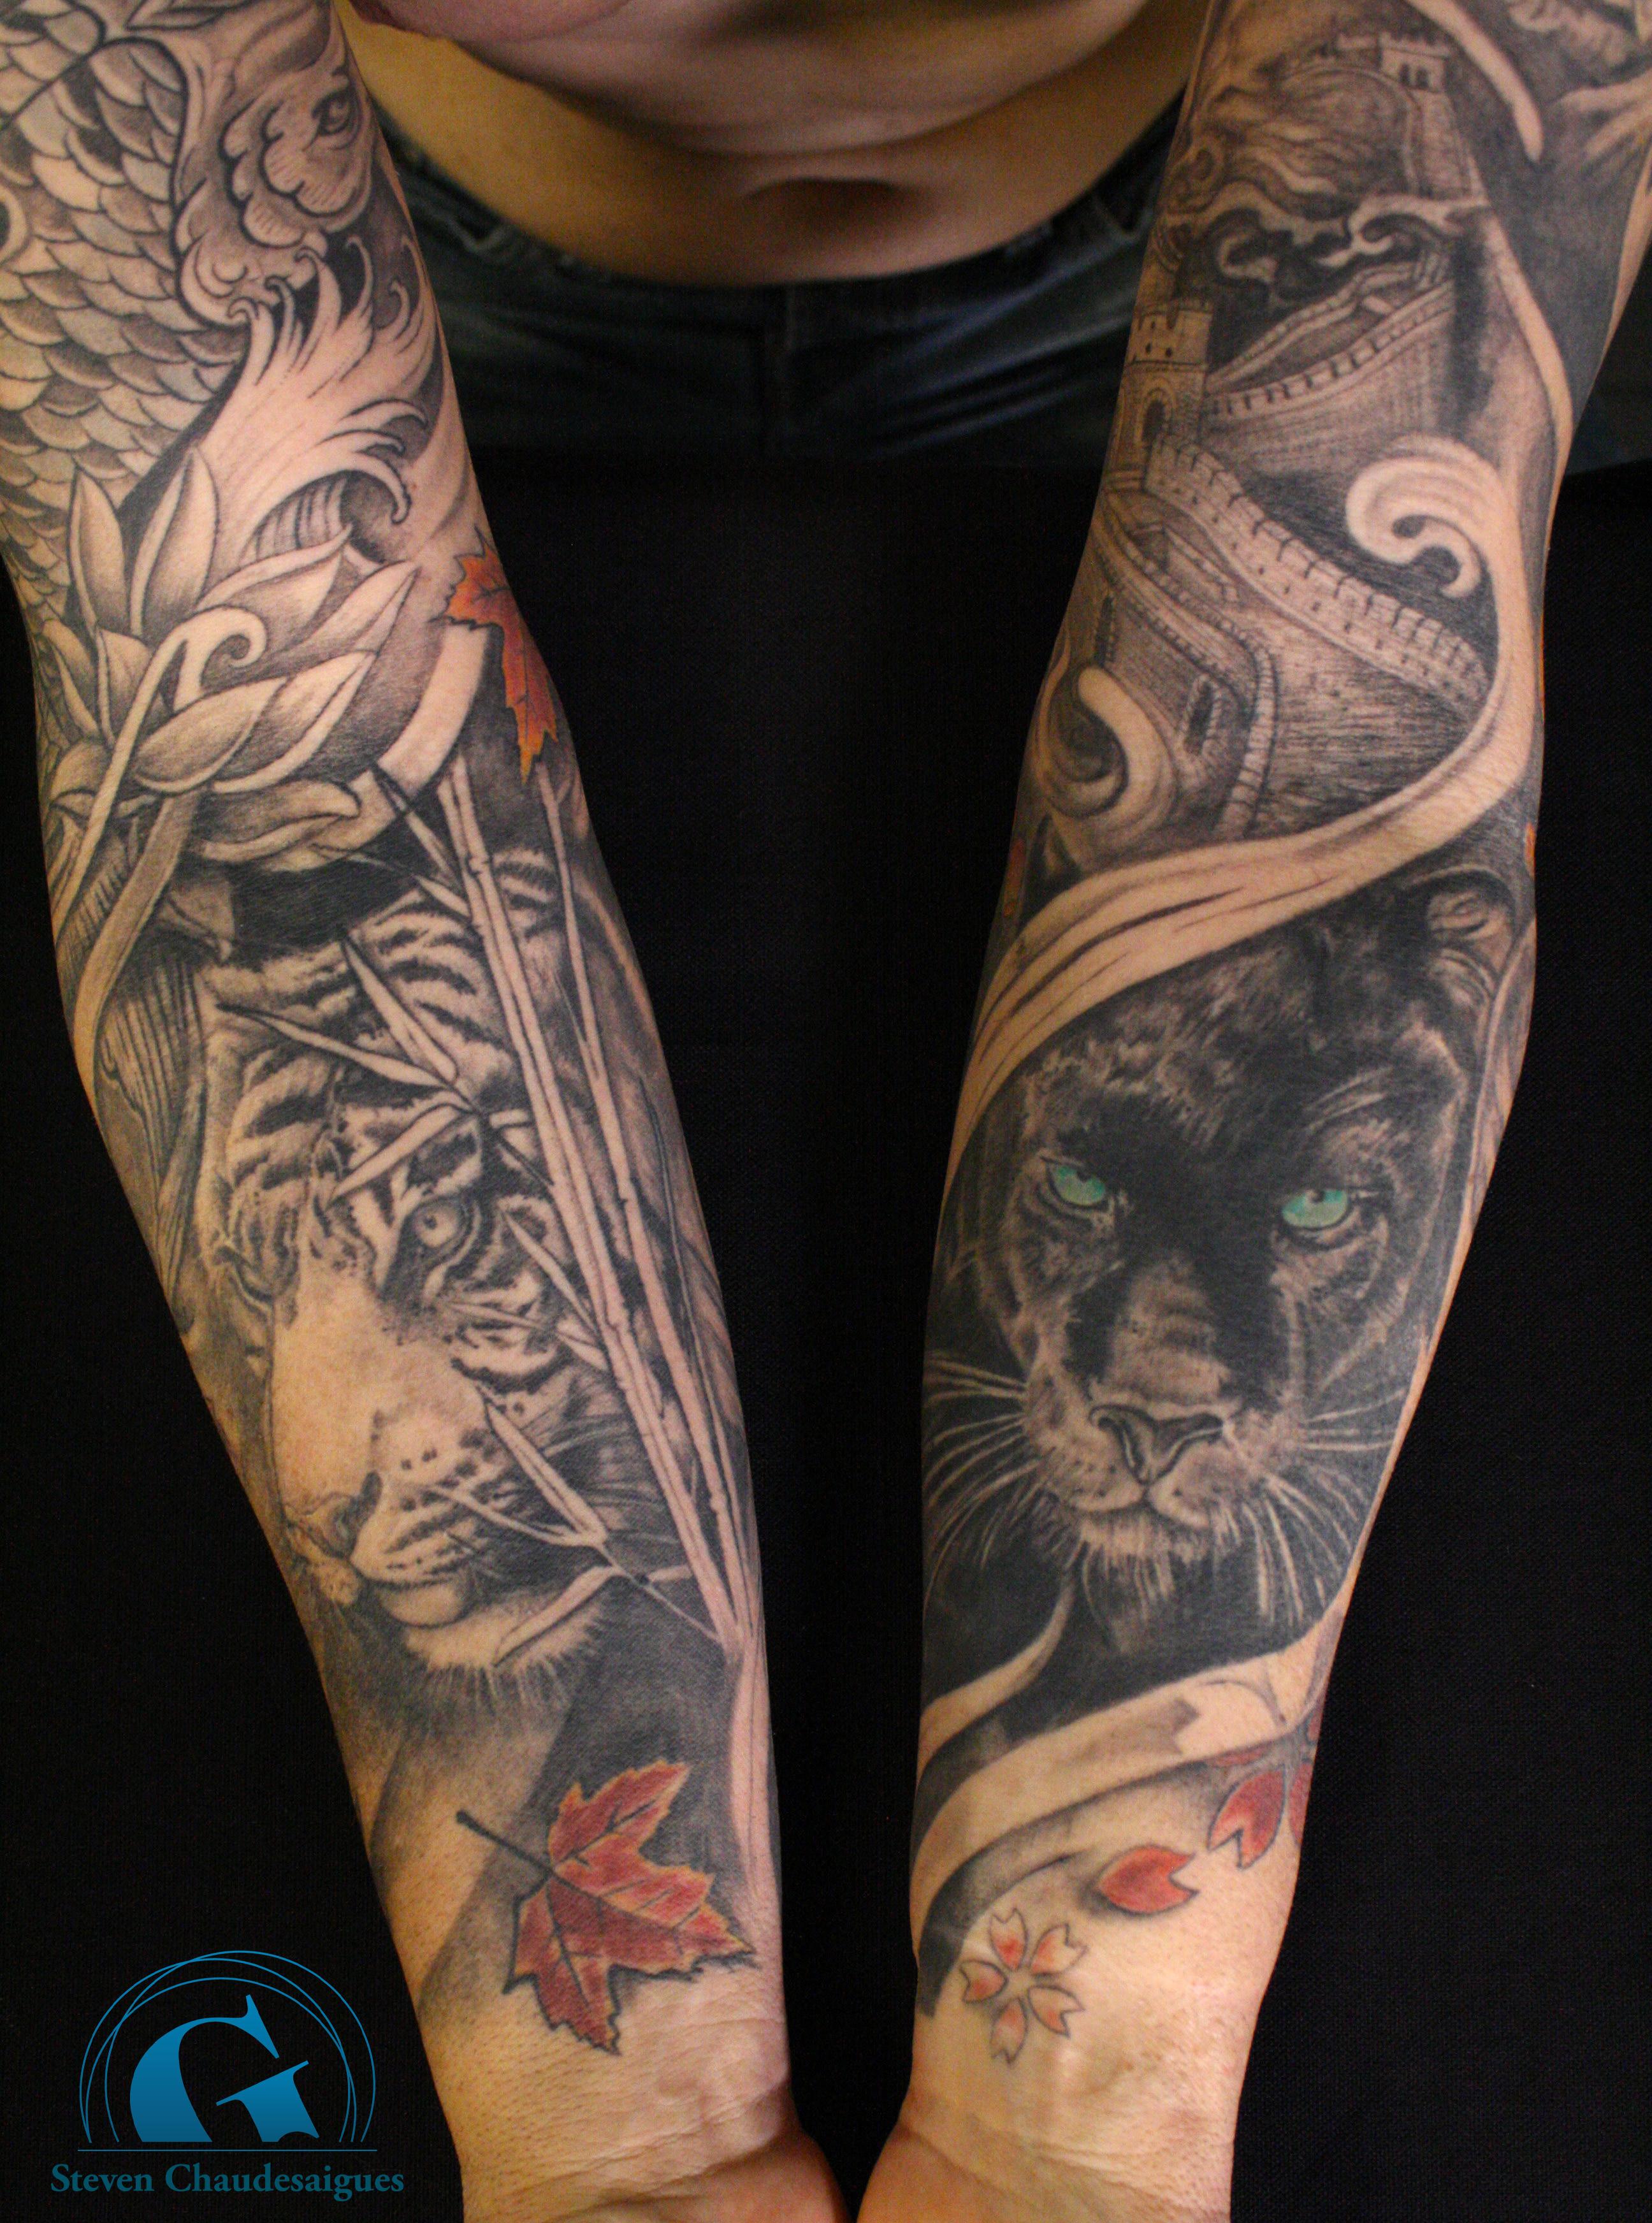 graphicaderme-avignon-vaucluse-tatoueurfrance-tatoueur-tigre-pantere-japonais-tatouagejaponais-stevenchaudesaigues-tattoo-tatouagejaponais-tatouagecarpe-tatouagebambou-tatouagemurailledechine.